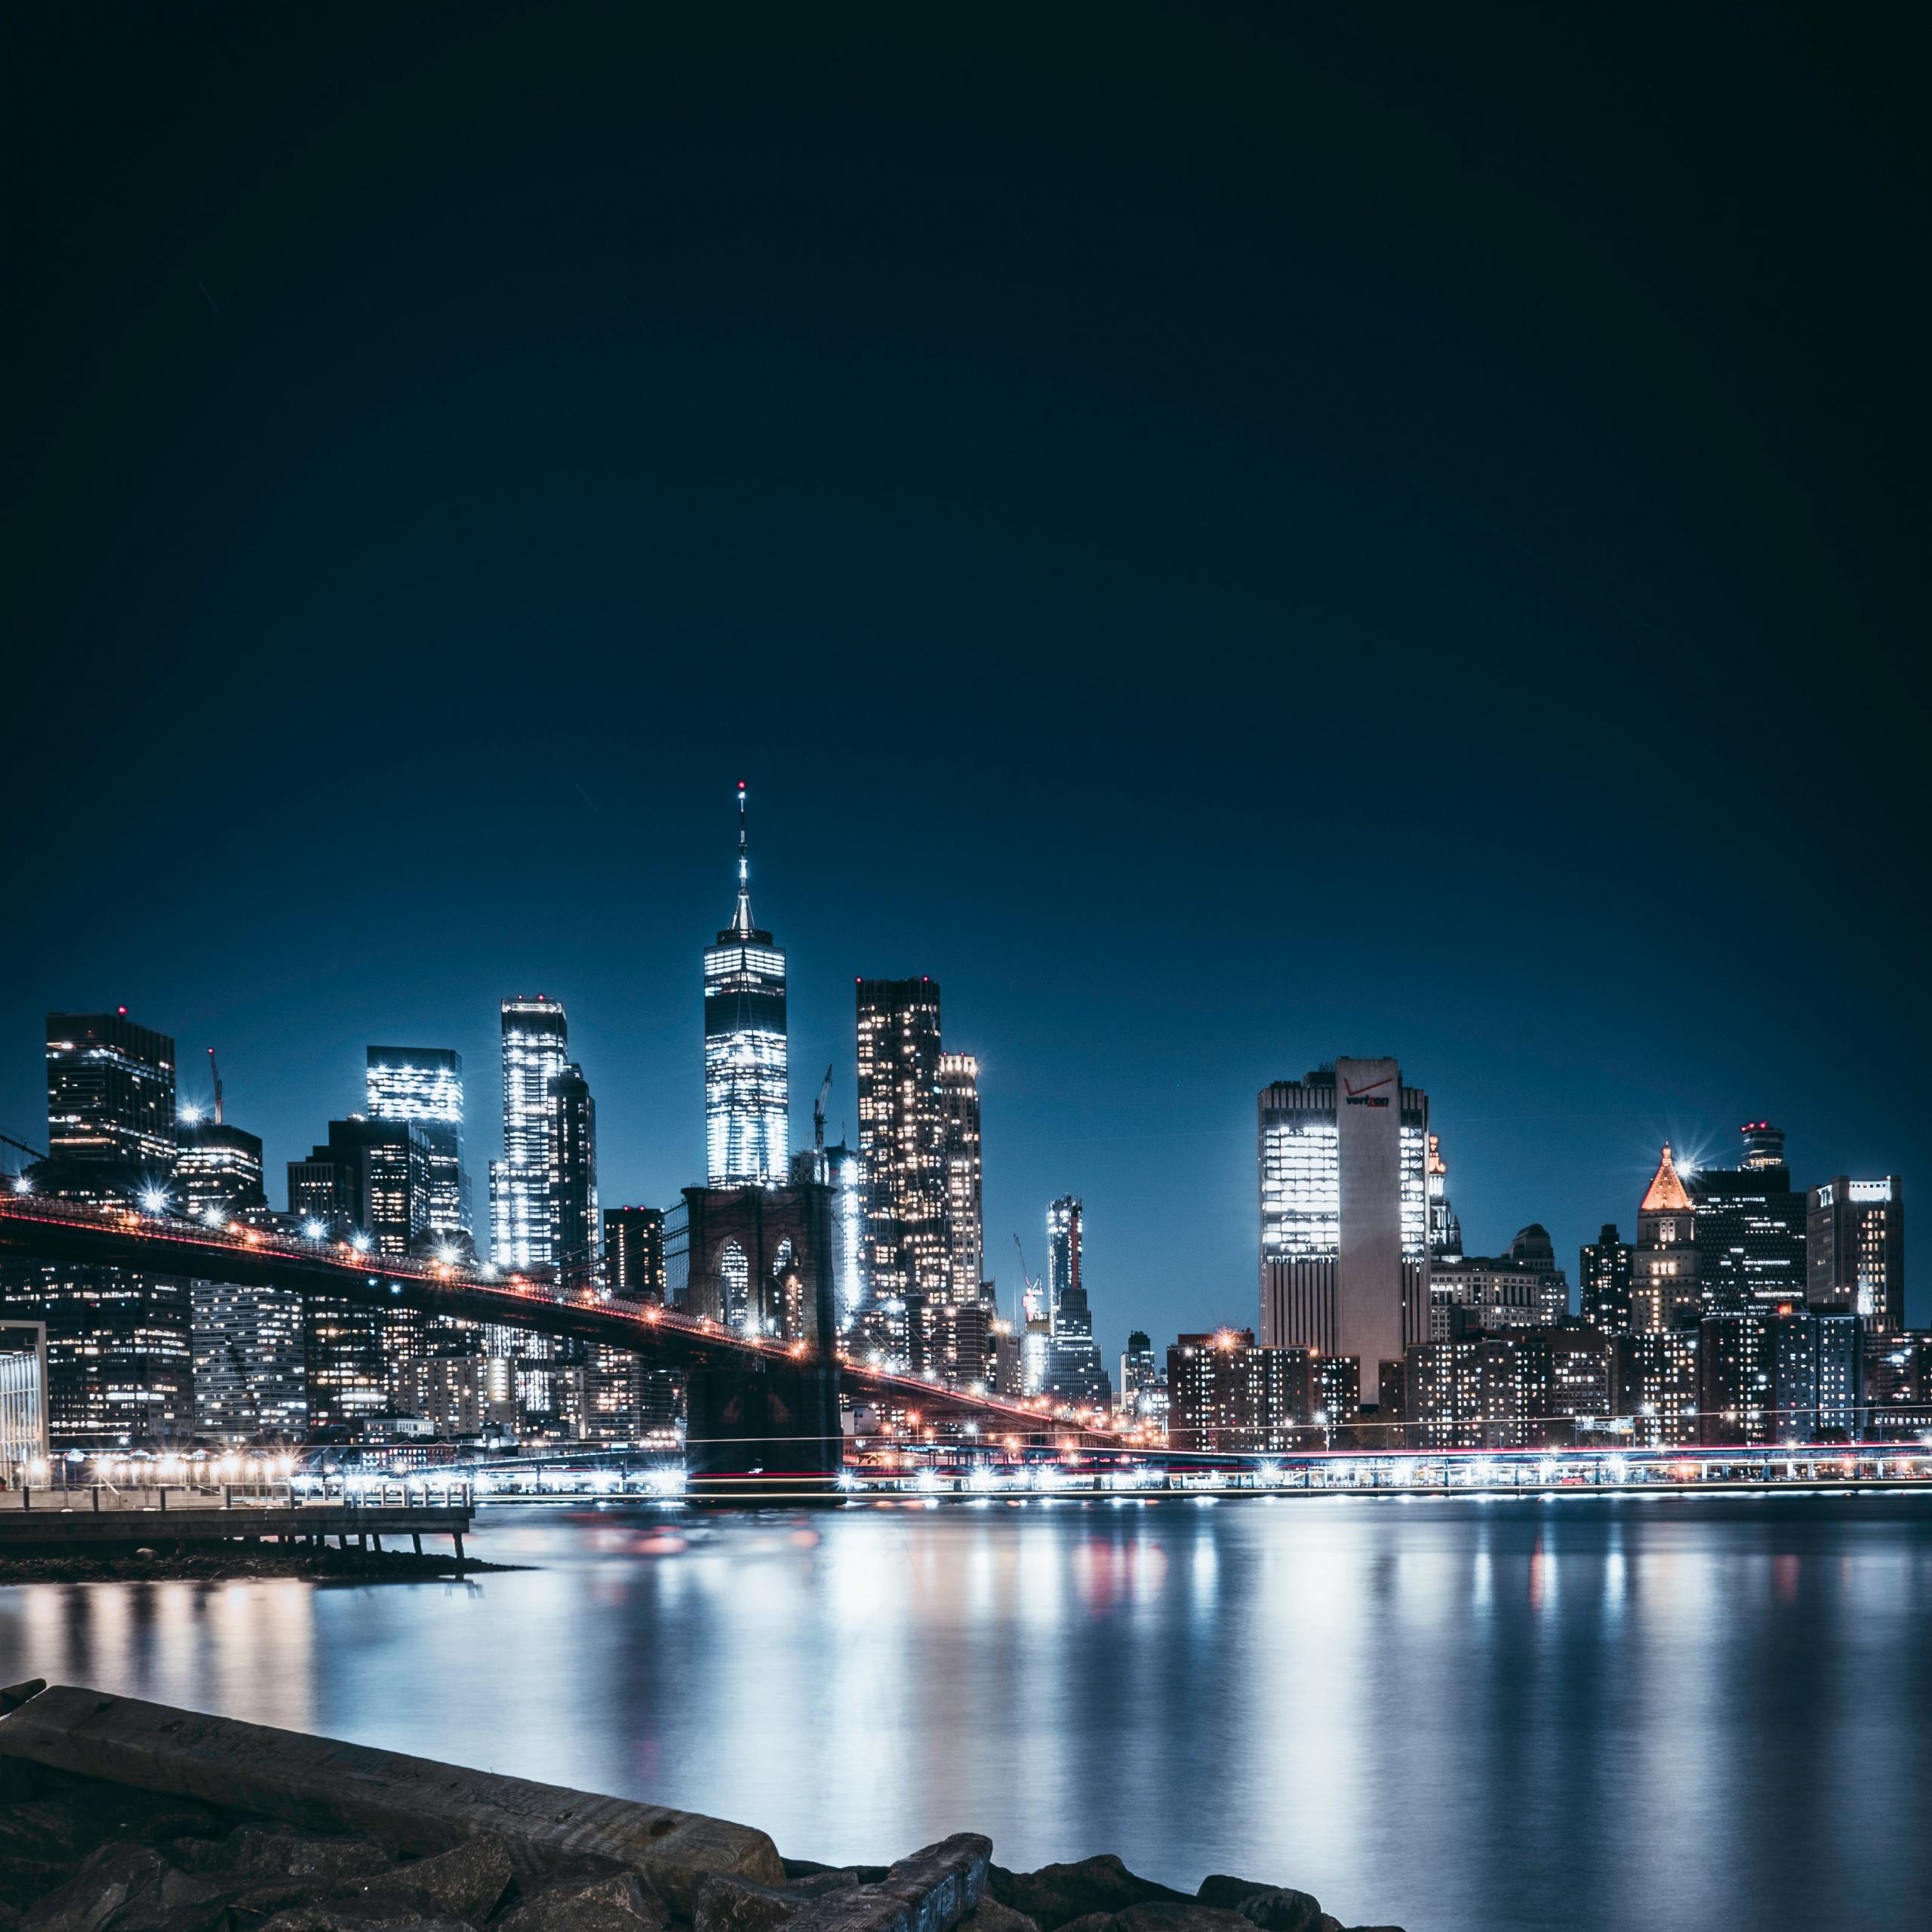 4K Wallpaper Brooklyn Bridge, Night, City Lights